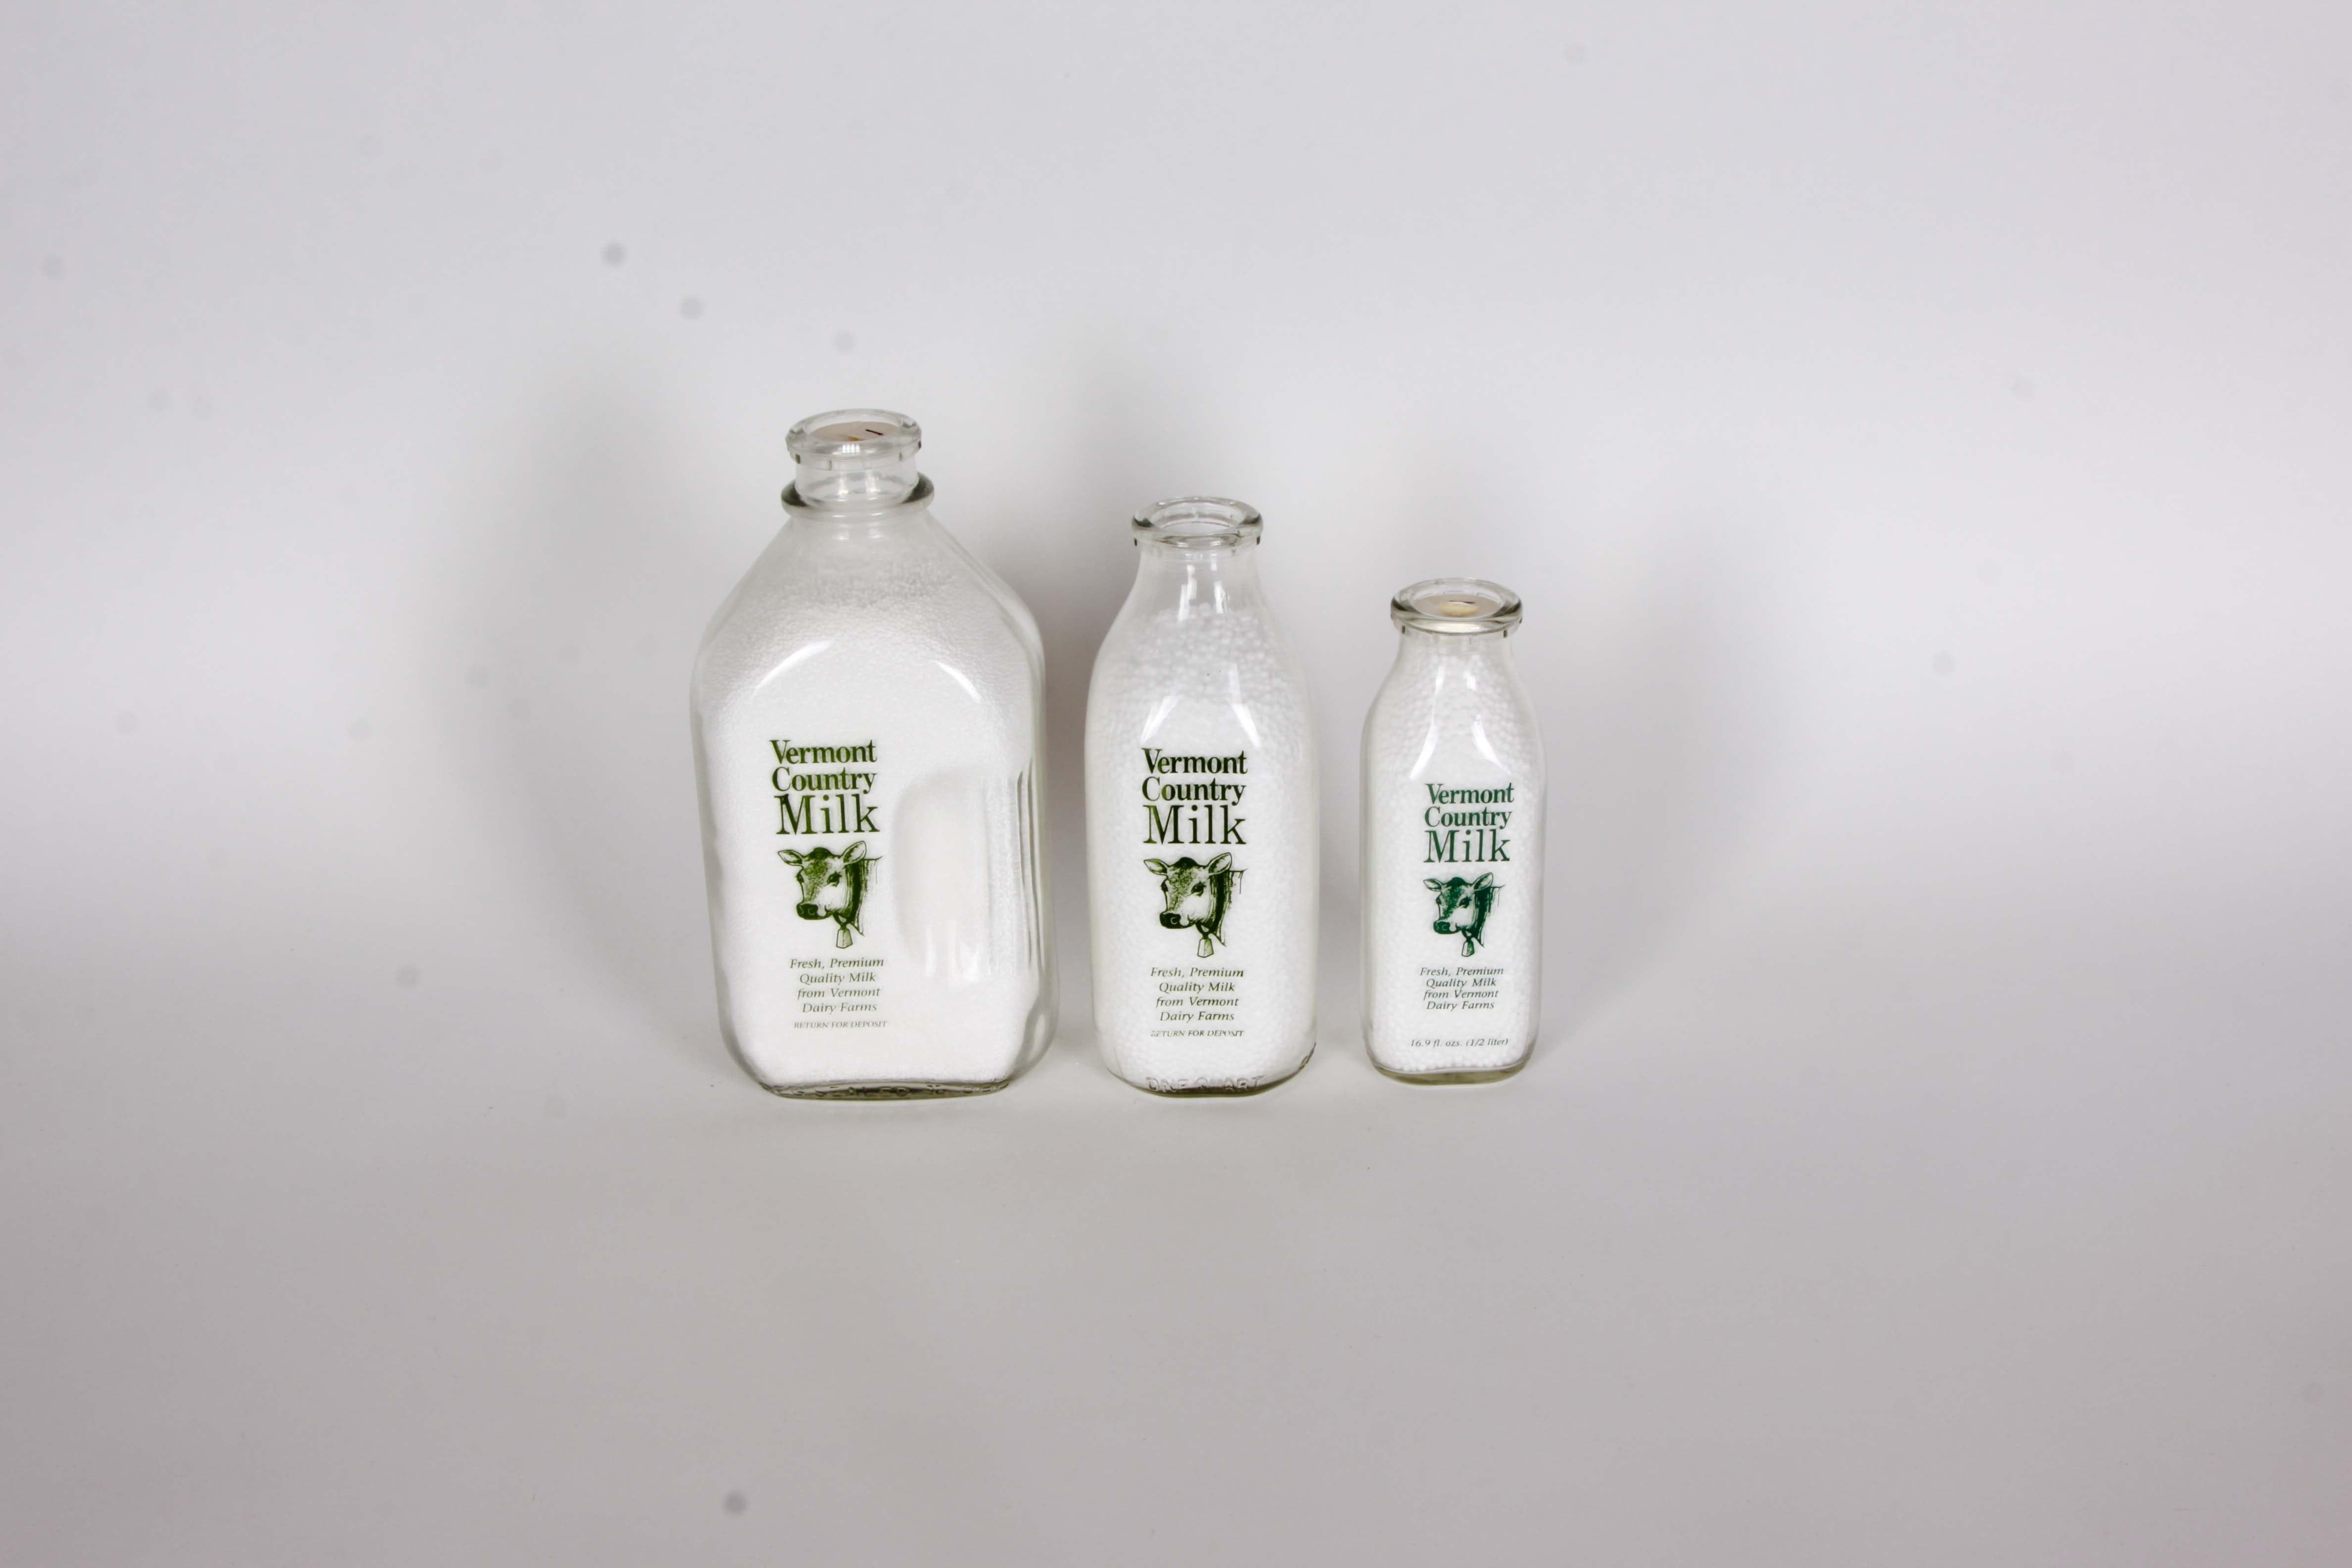 Vermont Country Milk Bottles Set